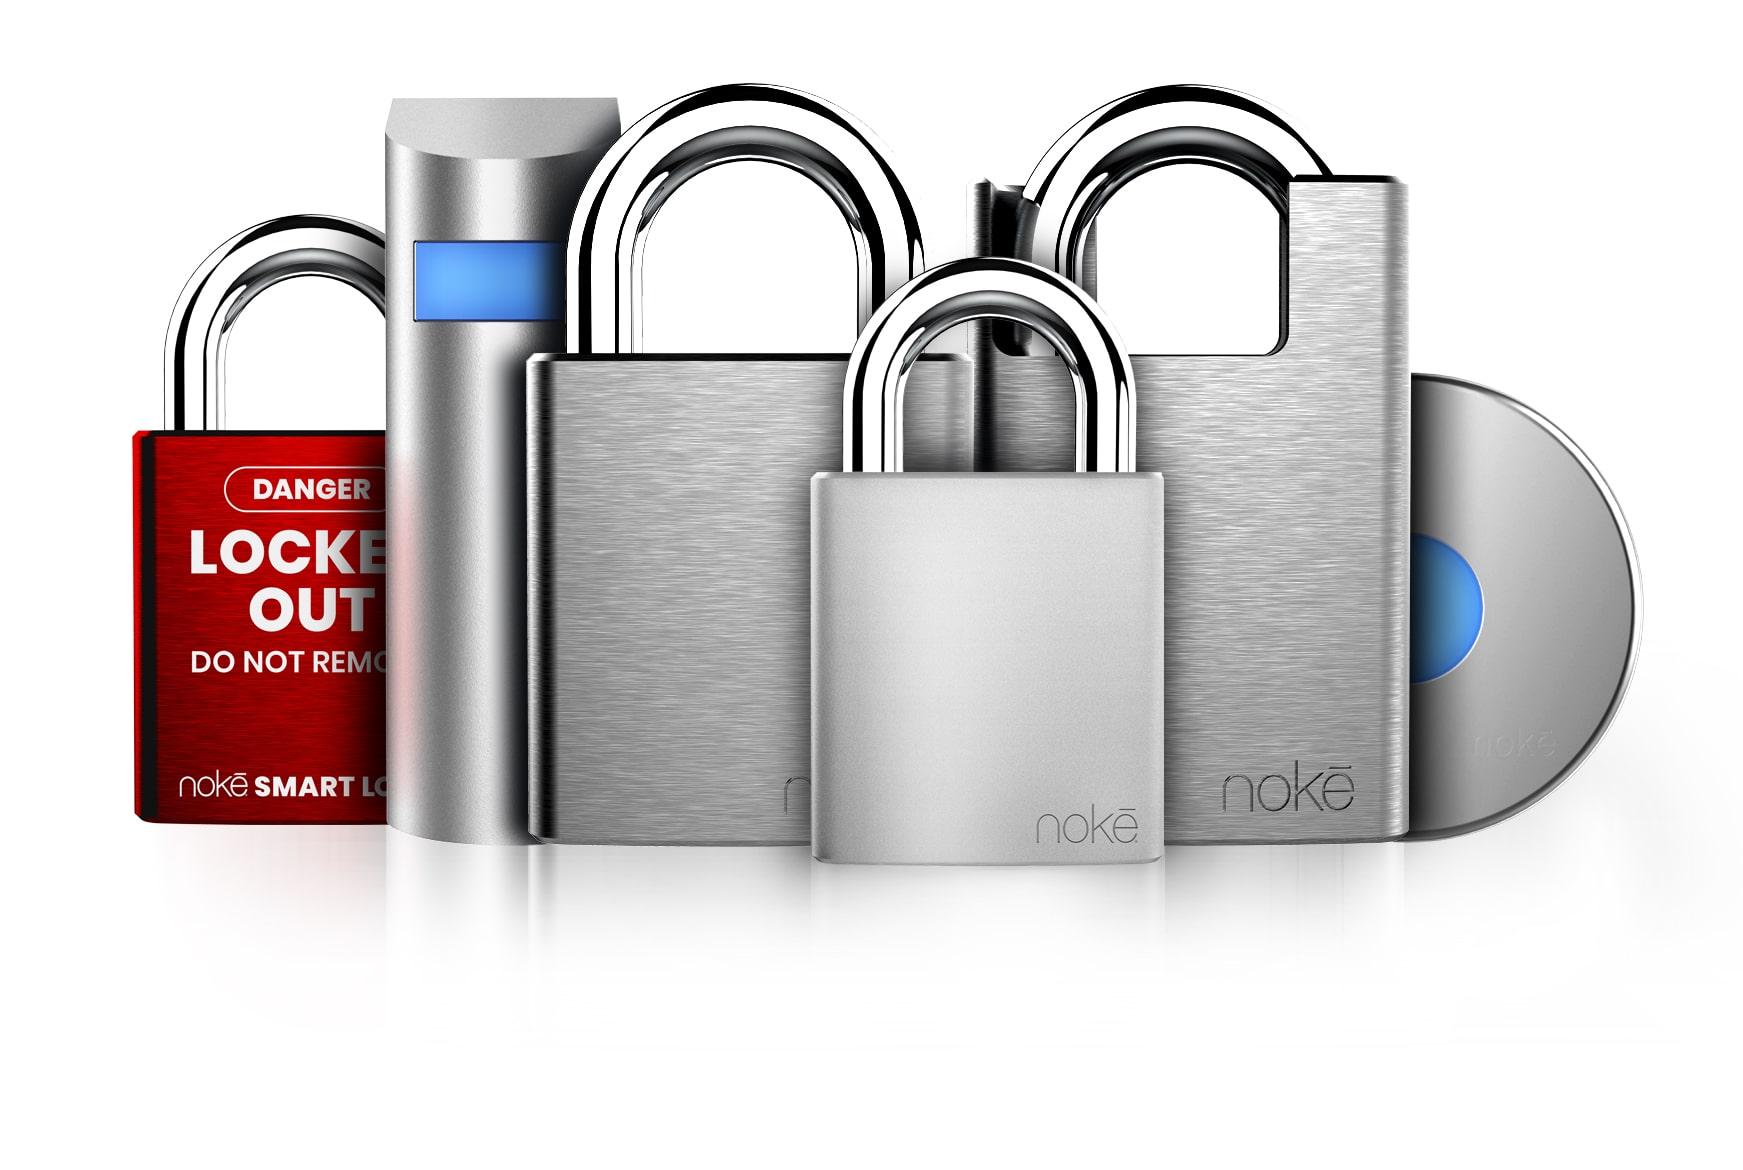 Nokē | Bluetooth padlock, door lock, U-Lock | Keyless Lock